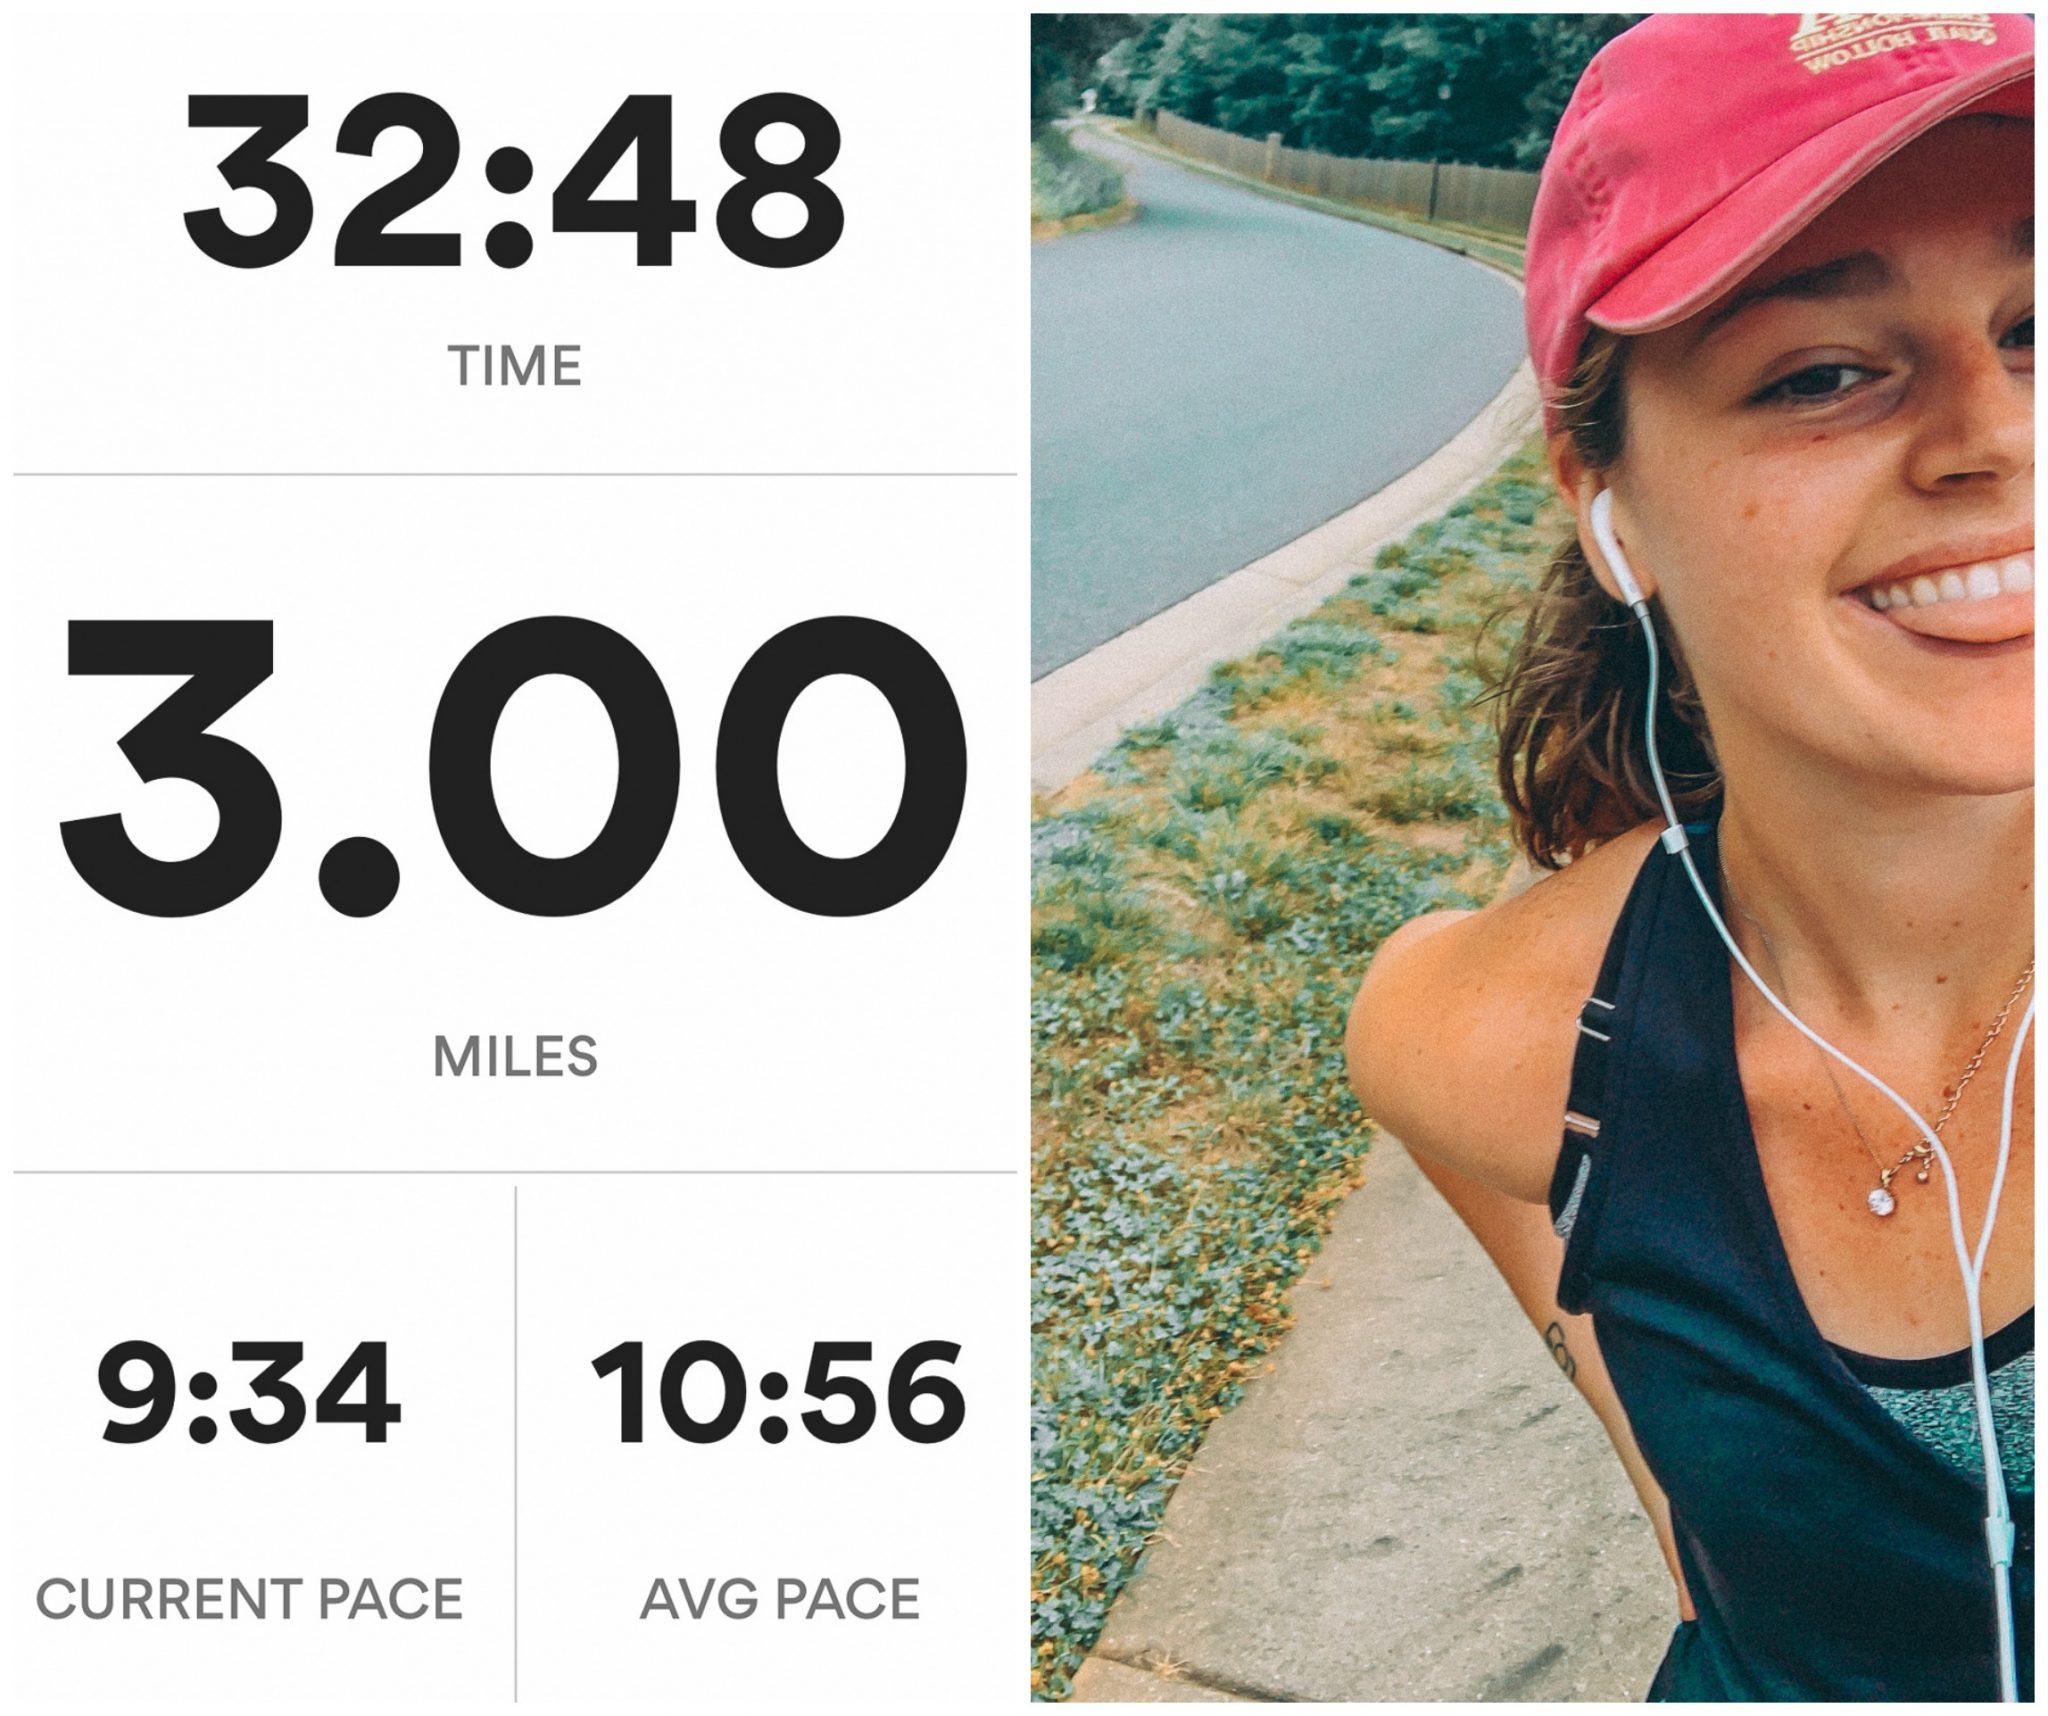 5k run three mile run fitness healthy living